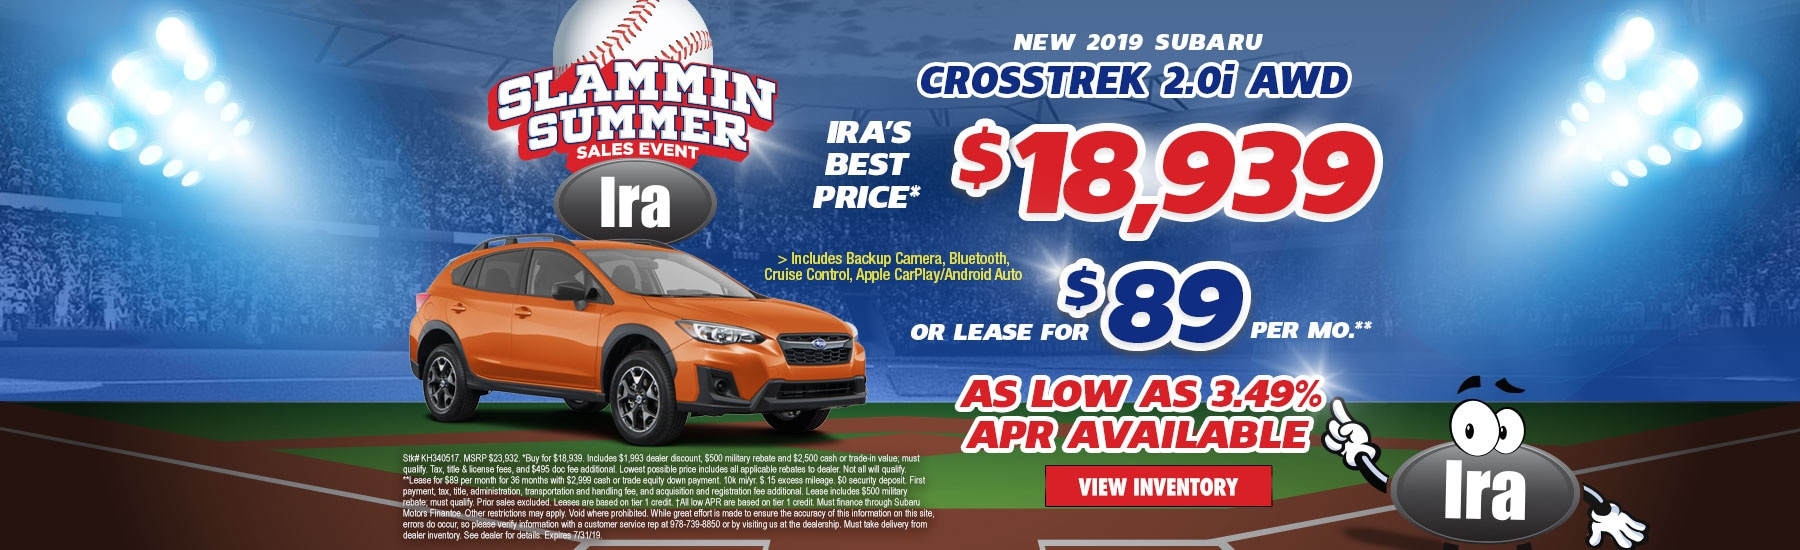 Subaru Dealers Ma | Upcoming New Car Release 2020